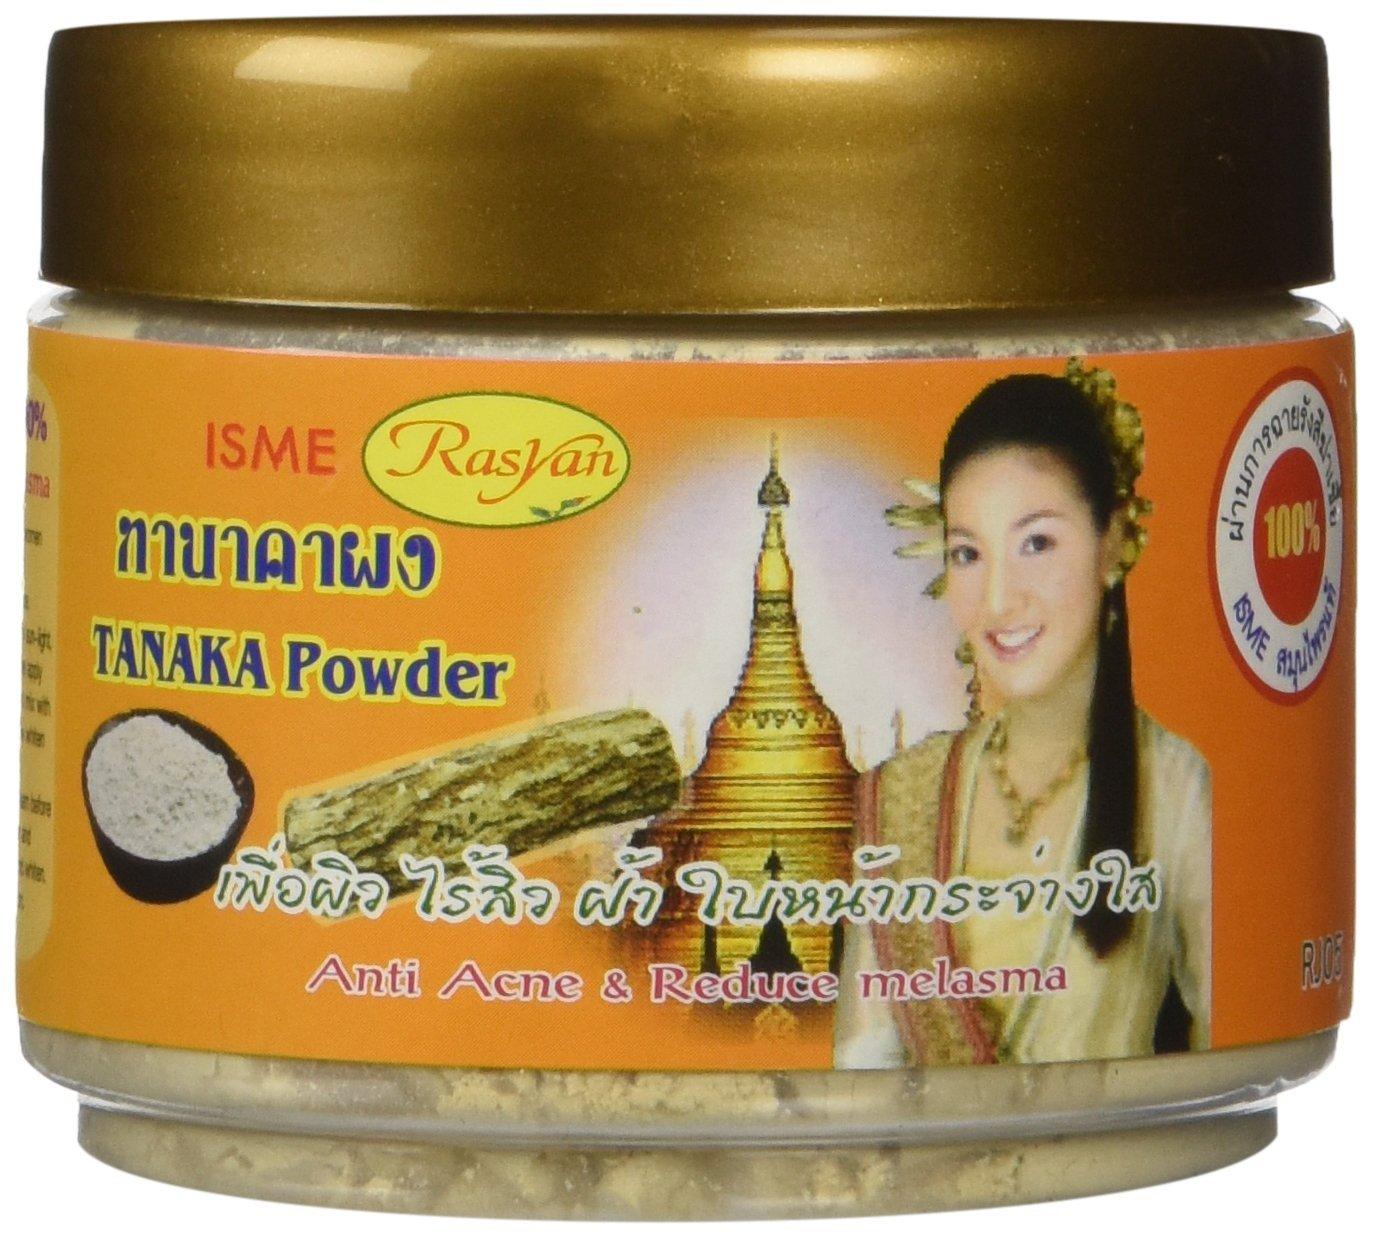 Isme Rasyan Thanaka Tanaka Powder 100% for Anti Acne & Reduce Melasma Natural Herbal 50g